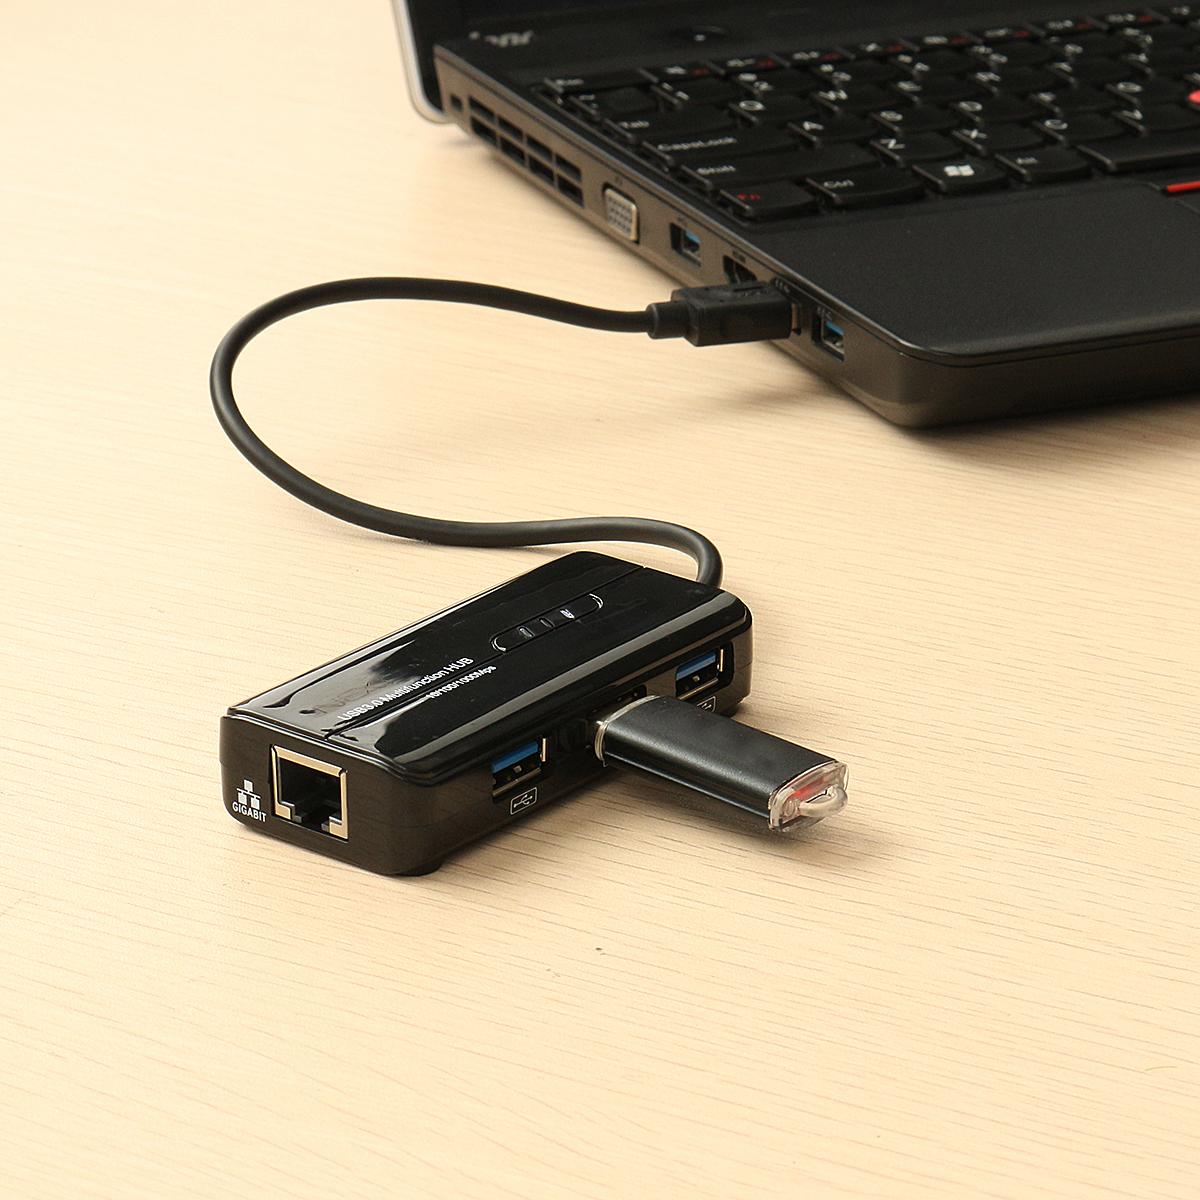 USB 3.0 to RJ45 Gigabit Ethernet 3 USB 3.0 Port Hub Network Card LAN Adapter for Laptop PC